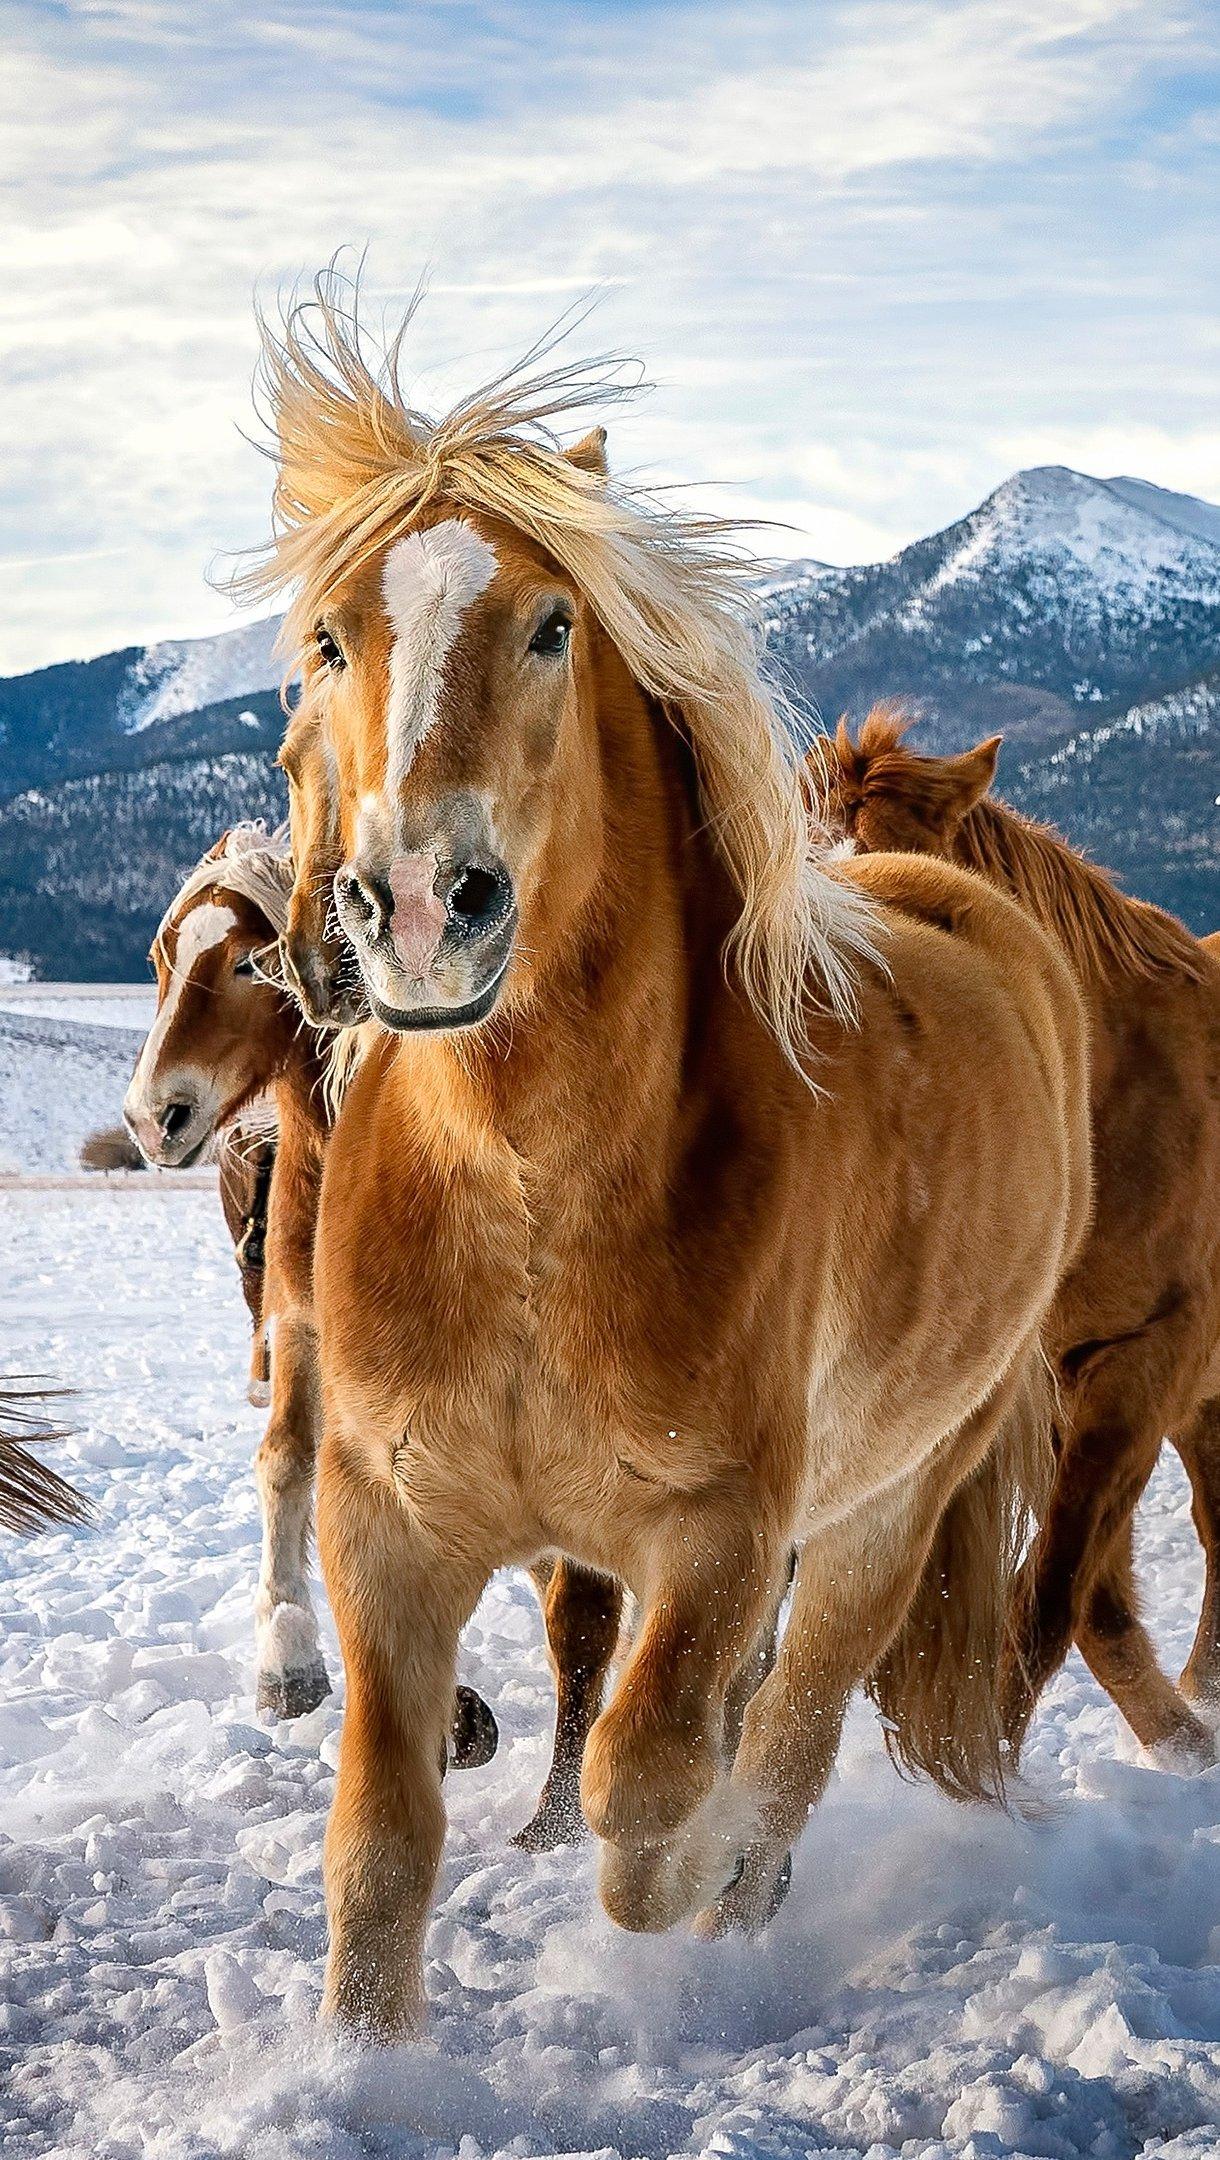 Wallpaper Horses running in the snow Vertical